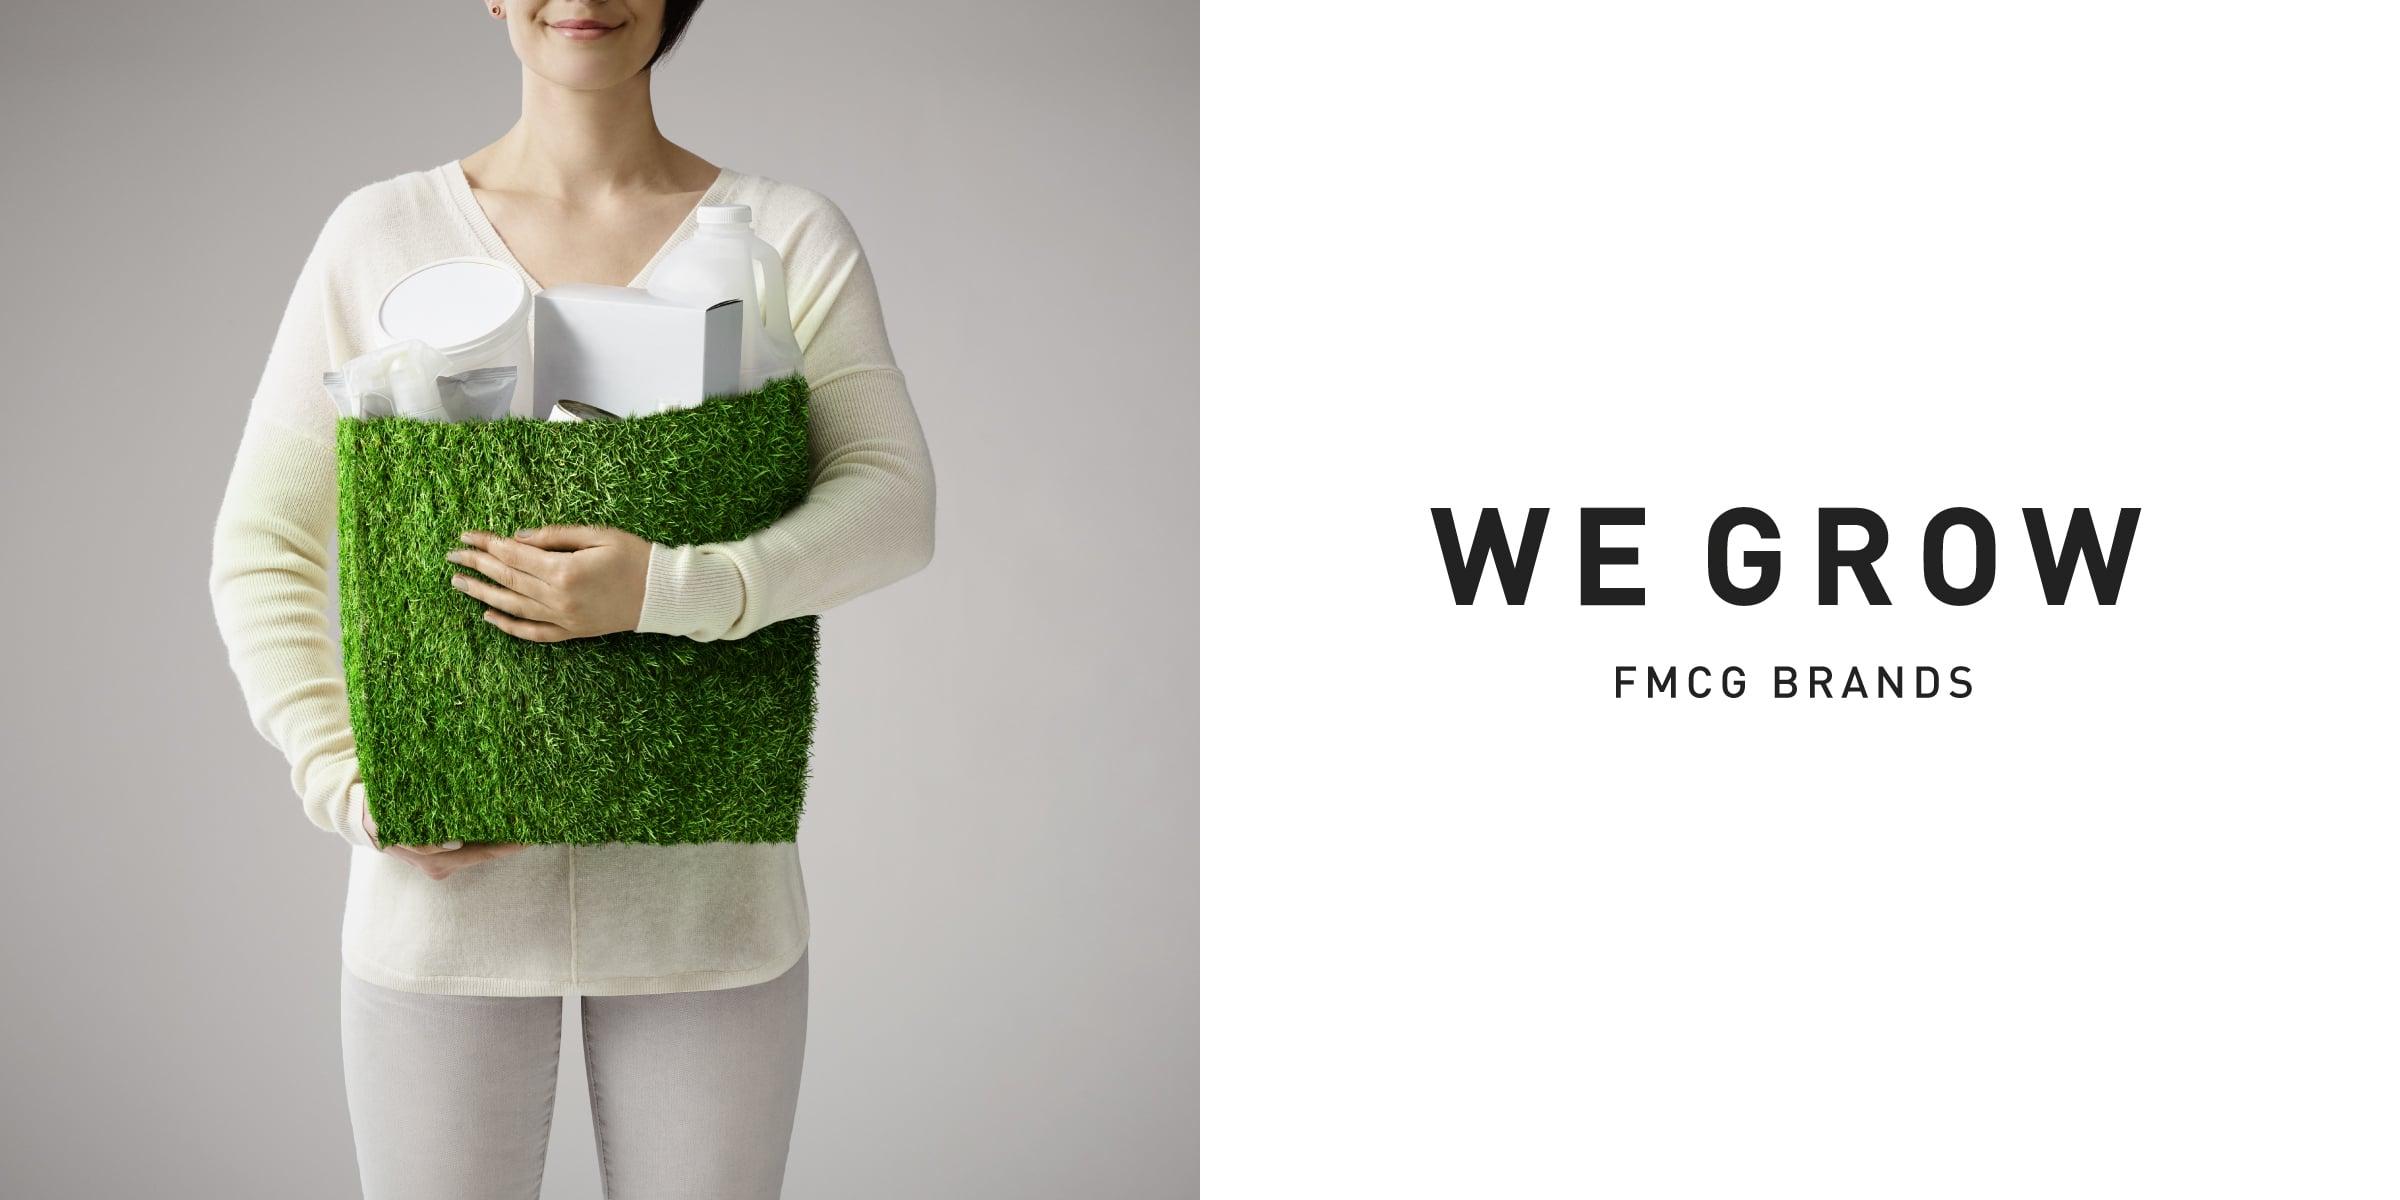 Davidson Branding We Grow Business Fast Moving Consumer Goods FMCG Packaging Grass Bag